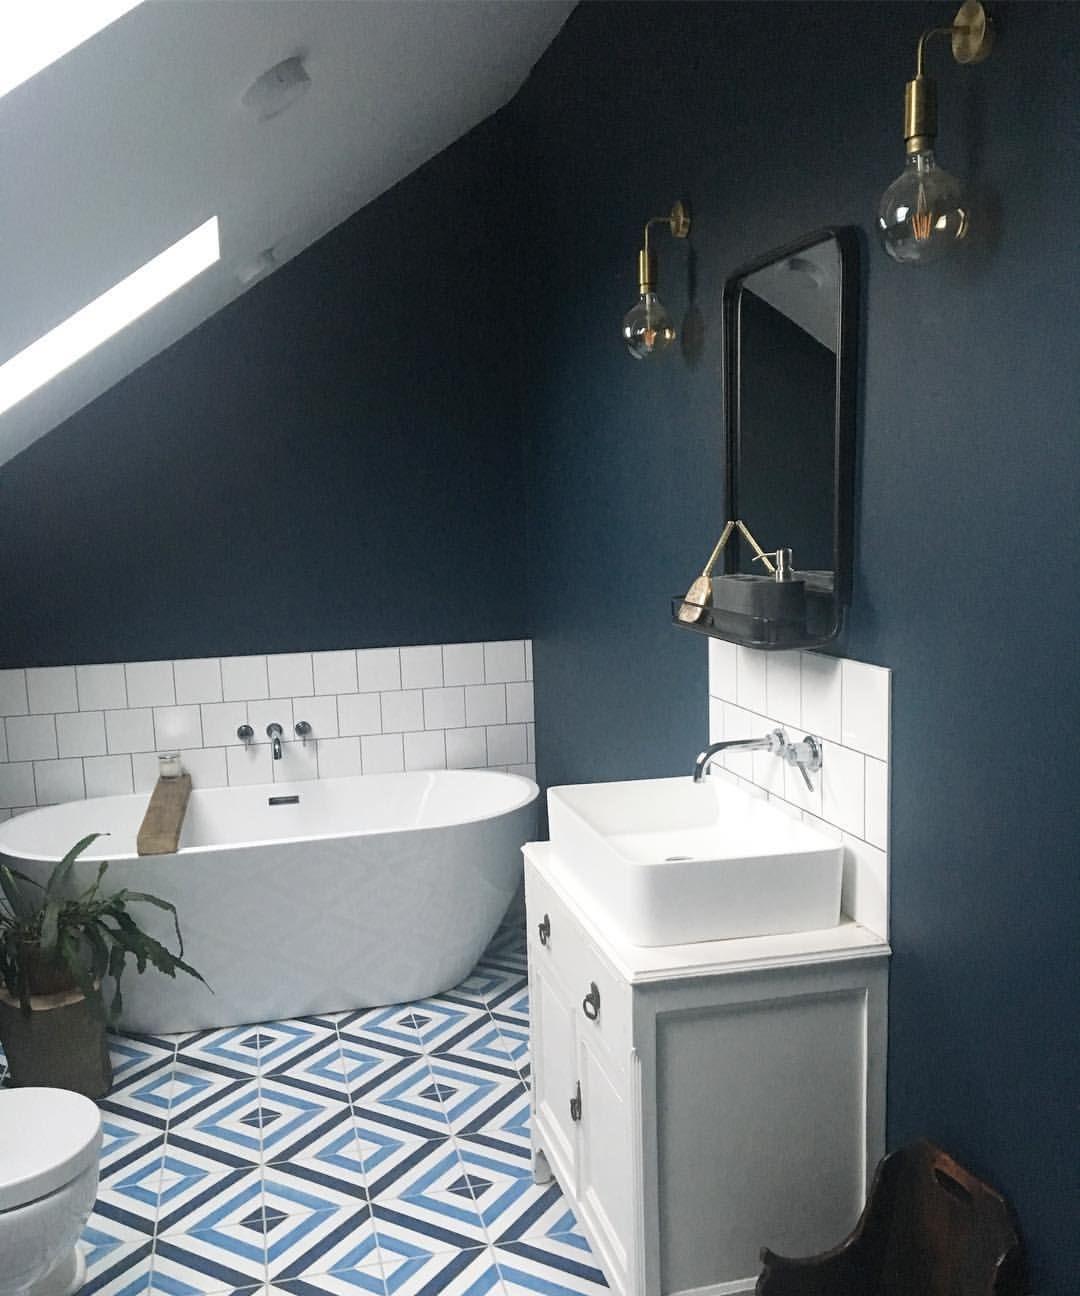 Dark Interior Walls Hague Blue Bathroom Freestanding Bath With Geometric Cement Encaustic Tiles Indust Blue Bathroom Paint Dark Blue Bathrooms Blue Bathroom